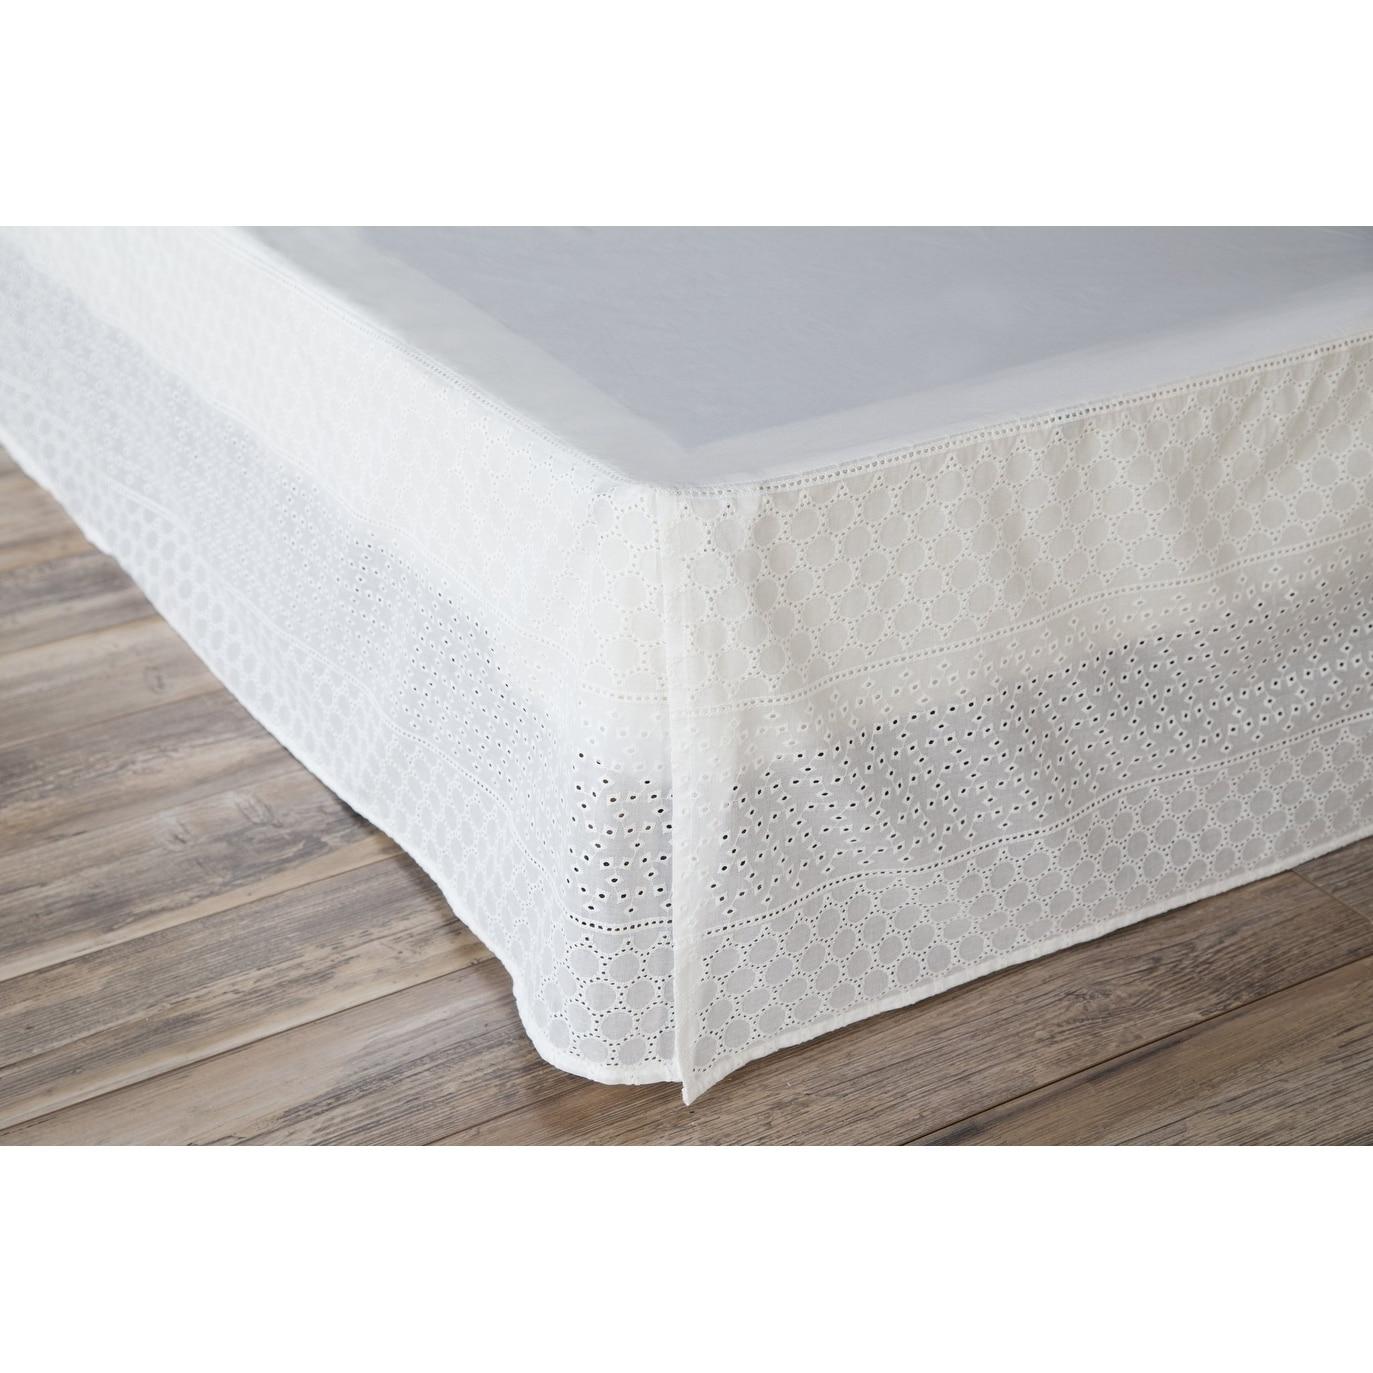 Shop Porch & Den Eleanor King size White Eyelet Bed Skirt